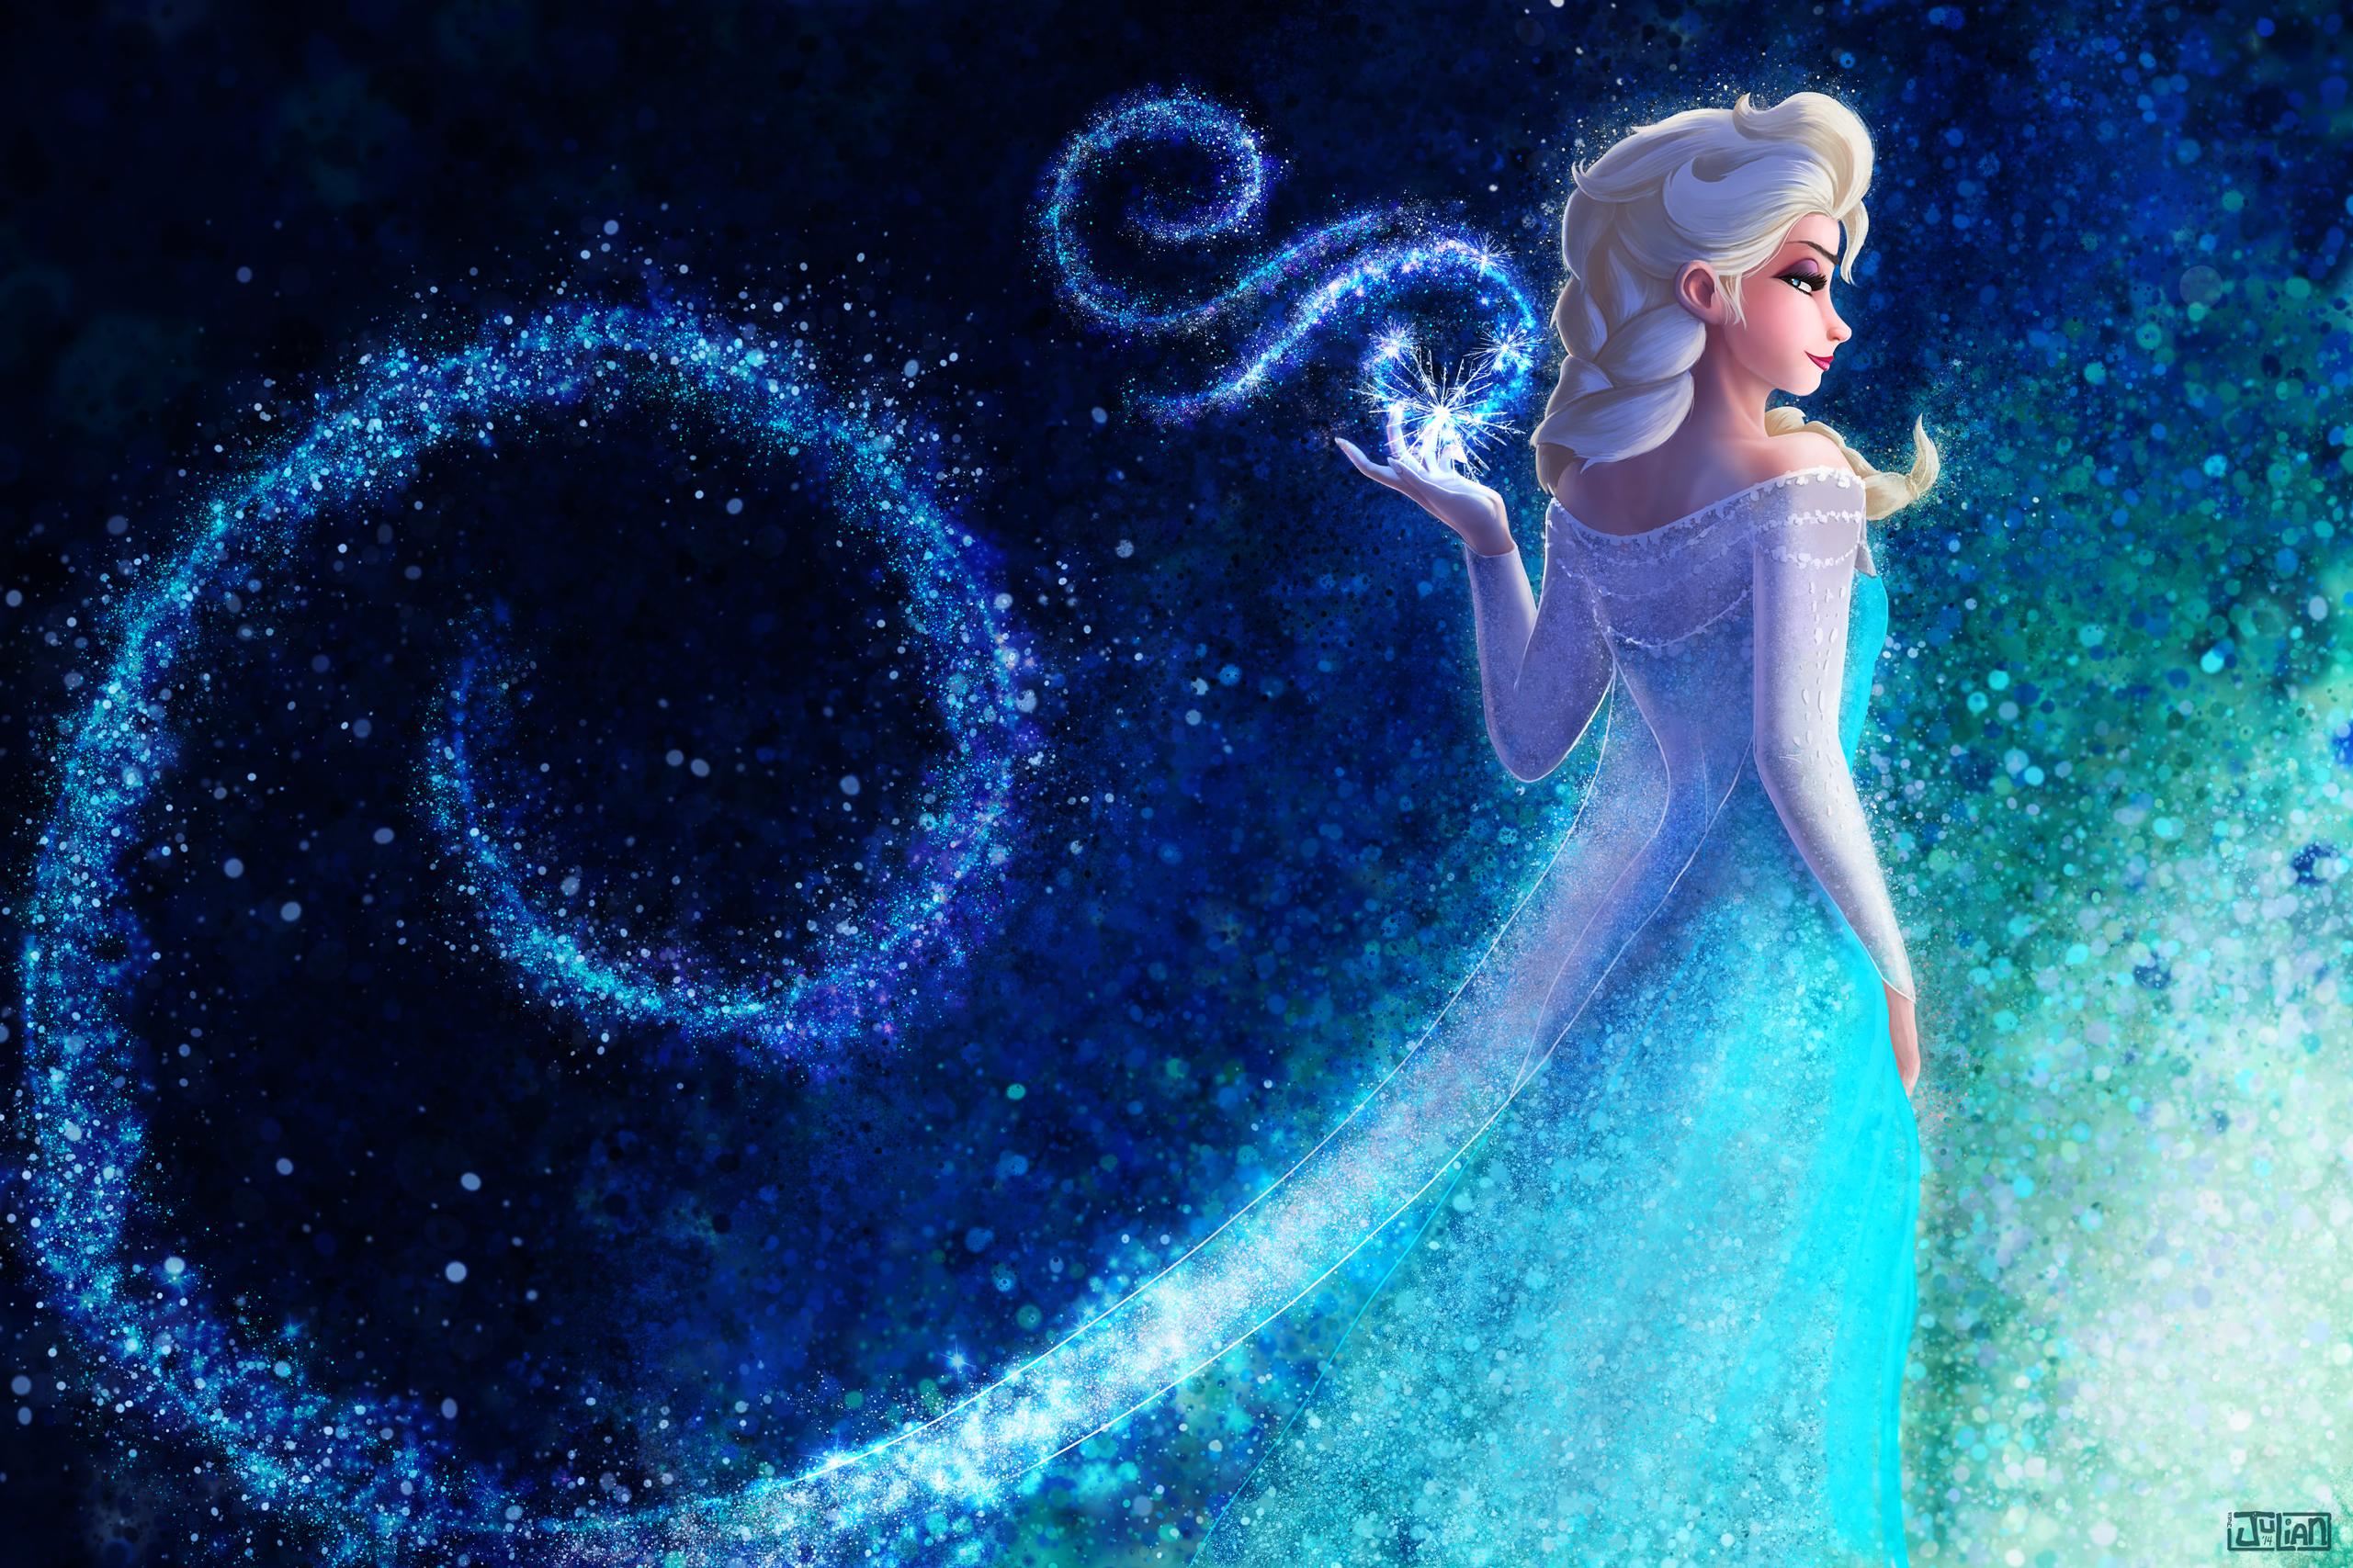 Elsa-5 By JoeyJulian Full HD Fond d'écran and Arrière-plan